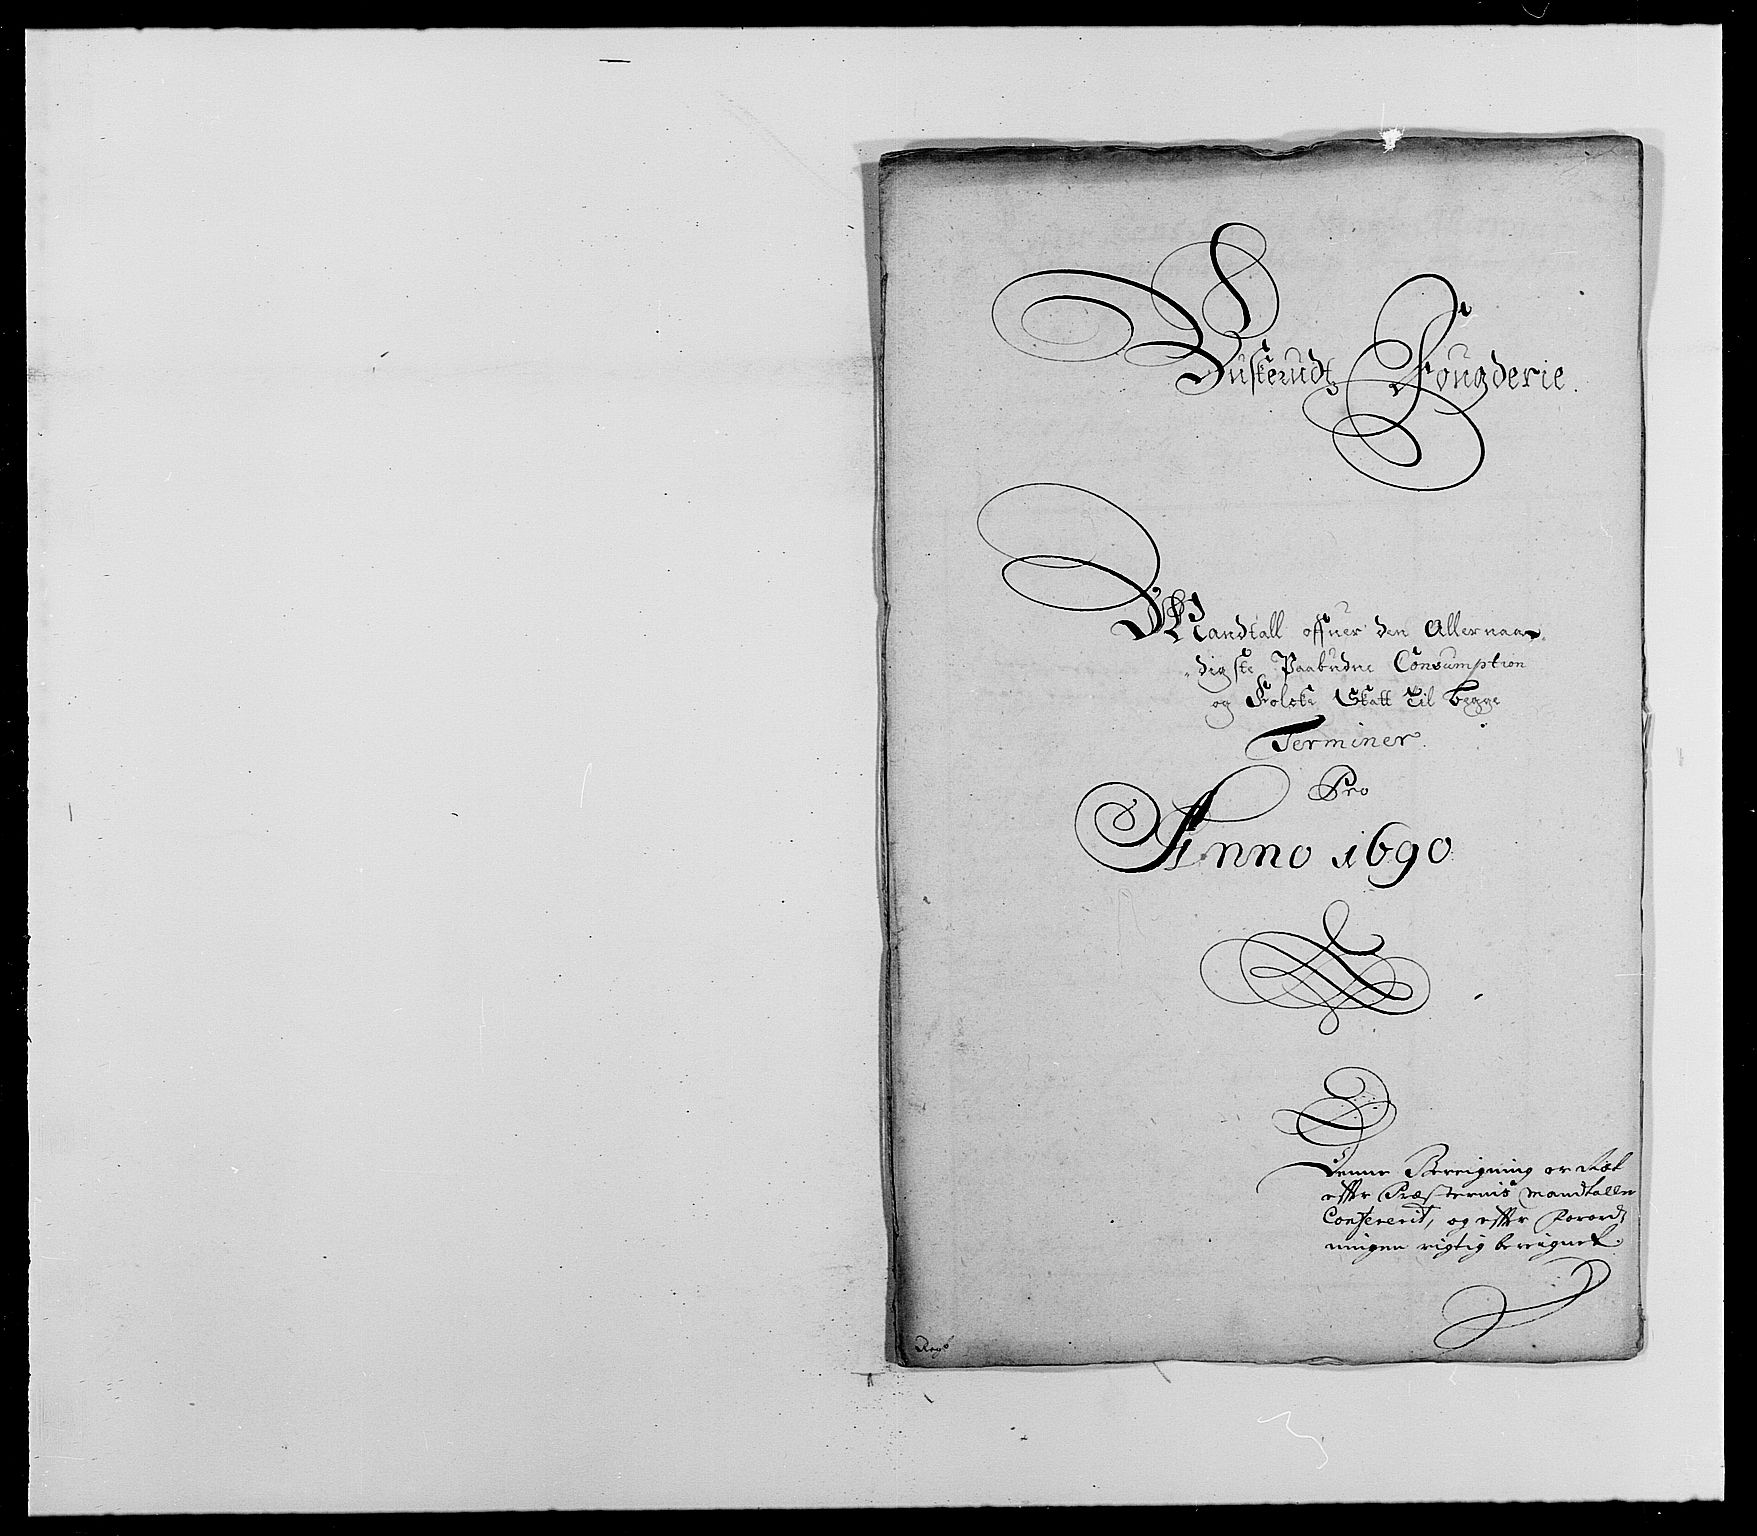 RA, Rentekammeret inntil 1814, Reviderte regnskaper, Fogderegnskap, R25/L1680: Fogderegnskap Buskerud, 1689-1690, s. 429